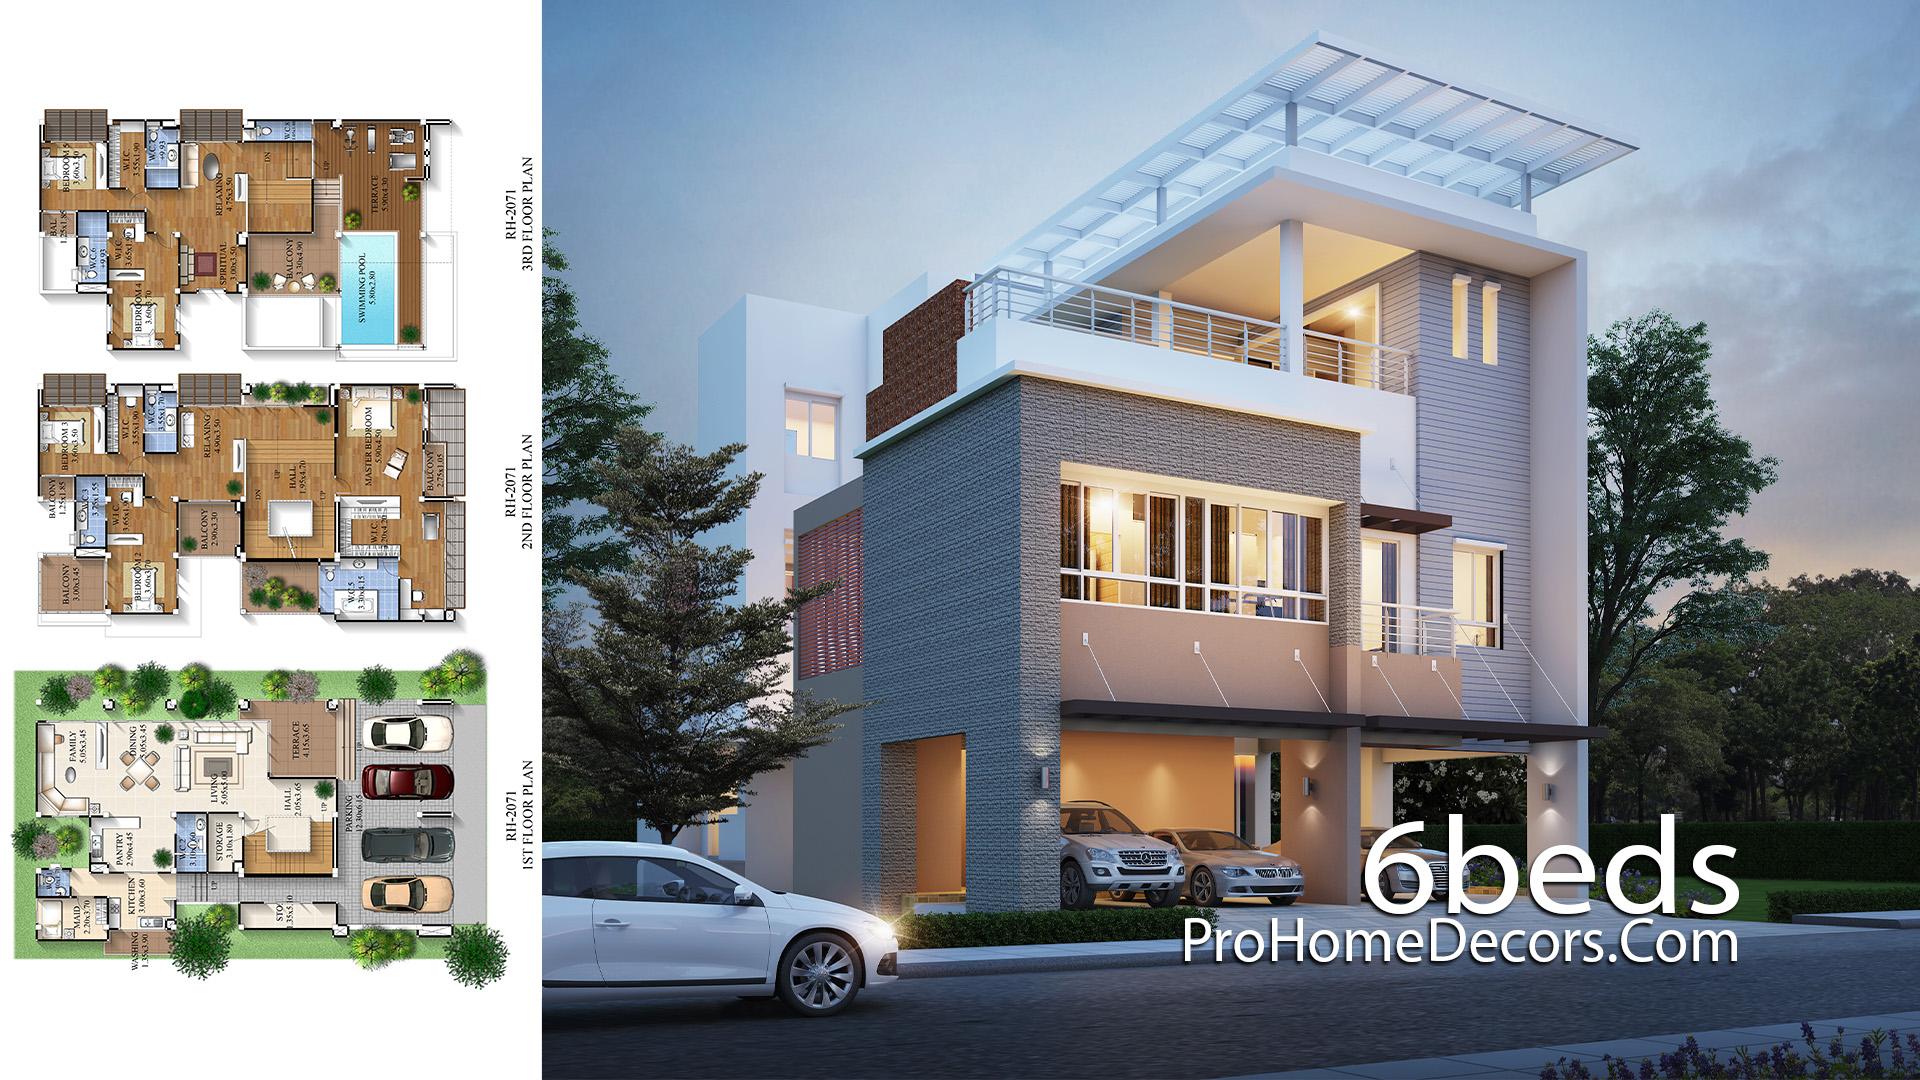 House-Design-Plan-12x20-Meter-with-6-Bedrooms